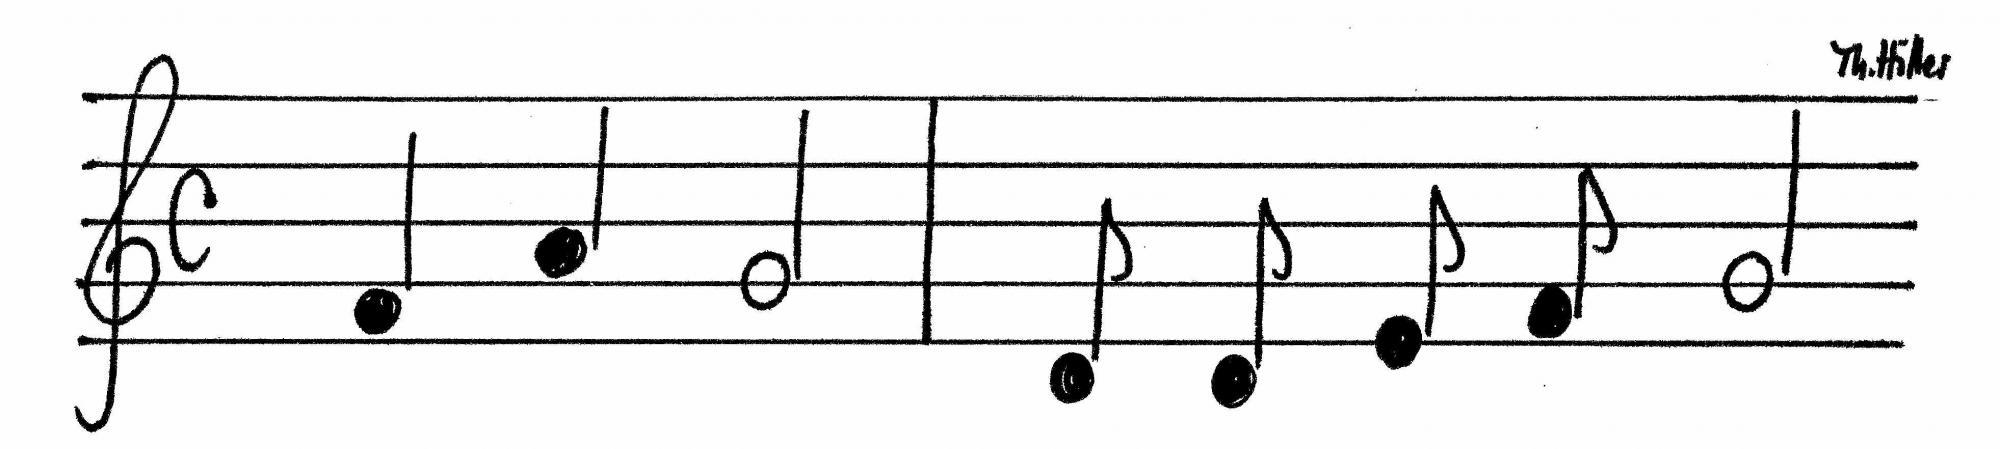 Sprachanfang - Präpositionen